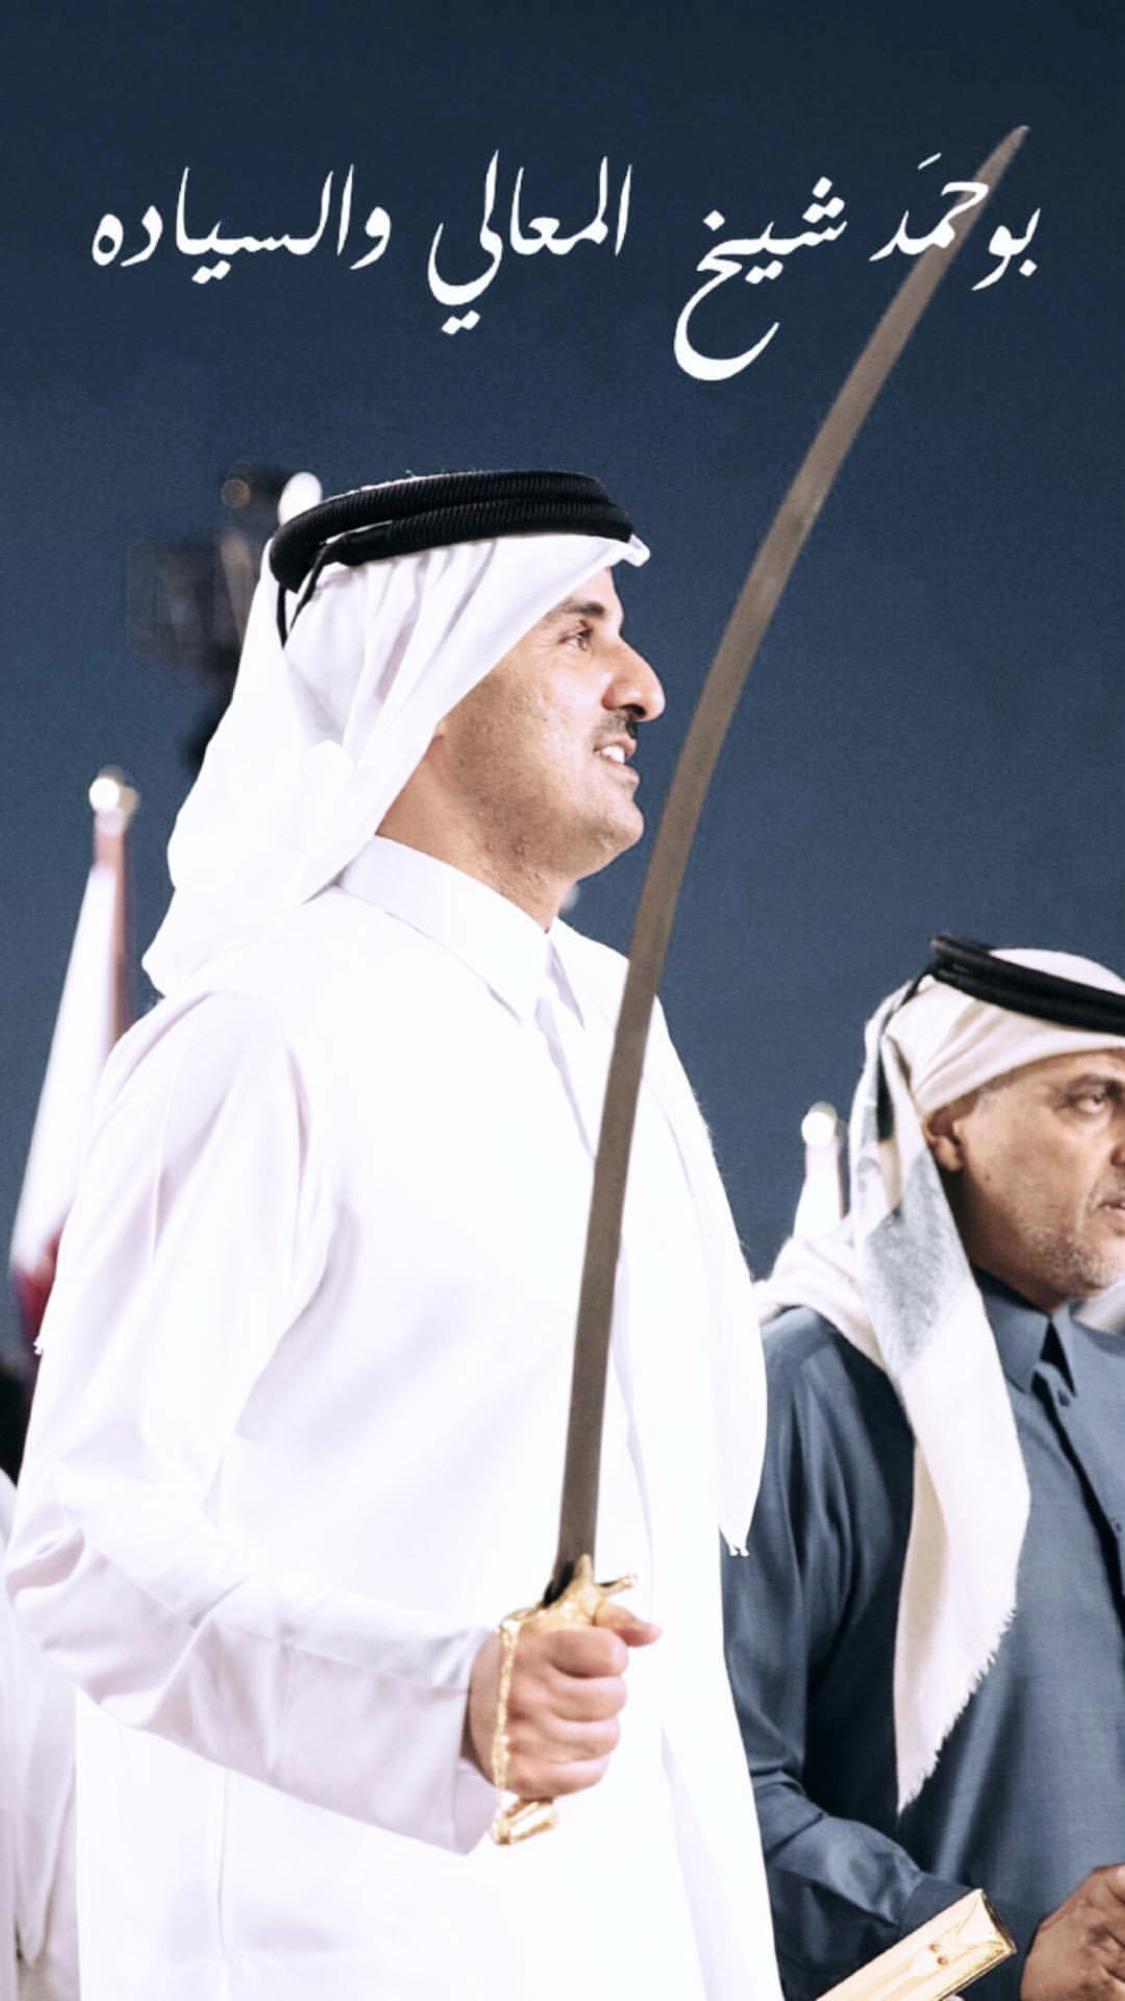 Qatar الامير الشيخ تميم بن حمد آل ثاني حفظه الله Qatar Dear Sheik